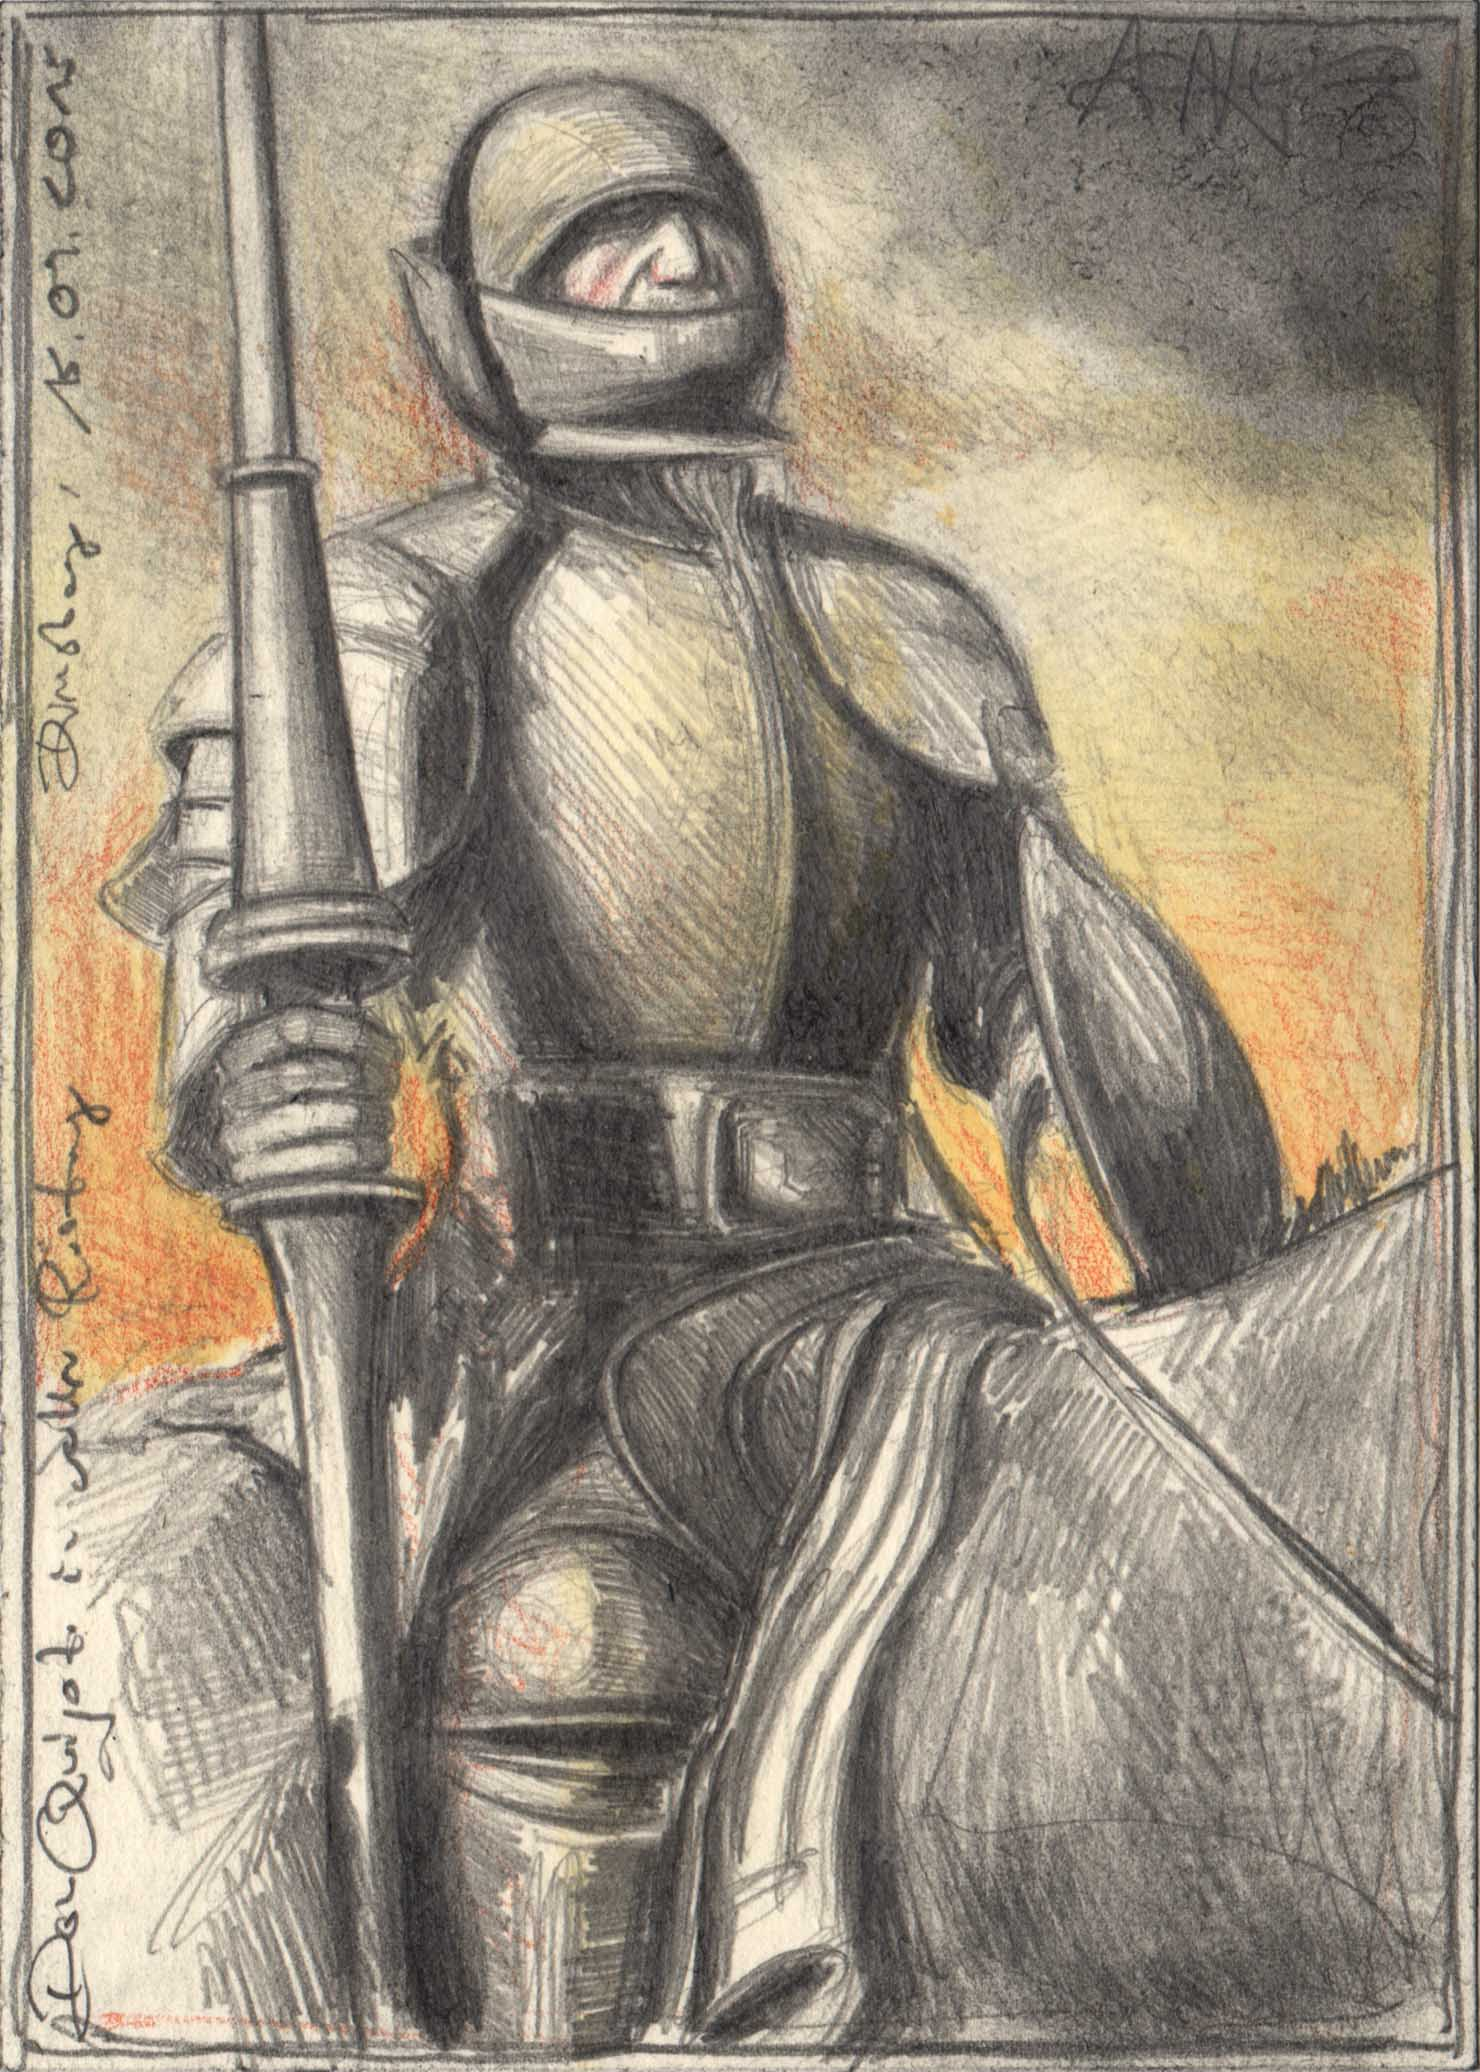 Don Quijote in full Armor